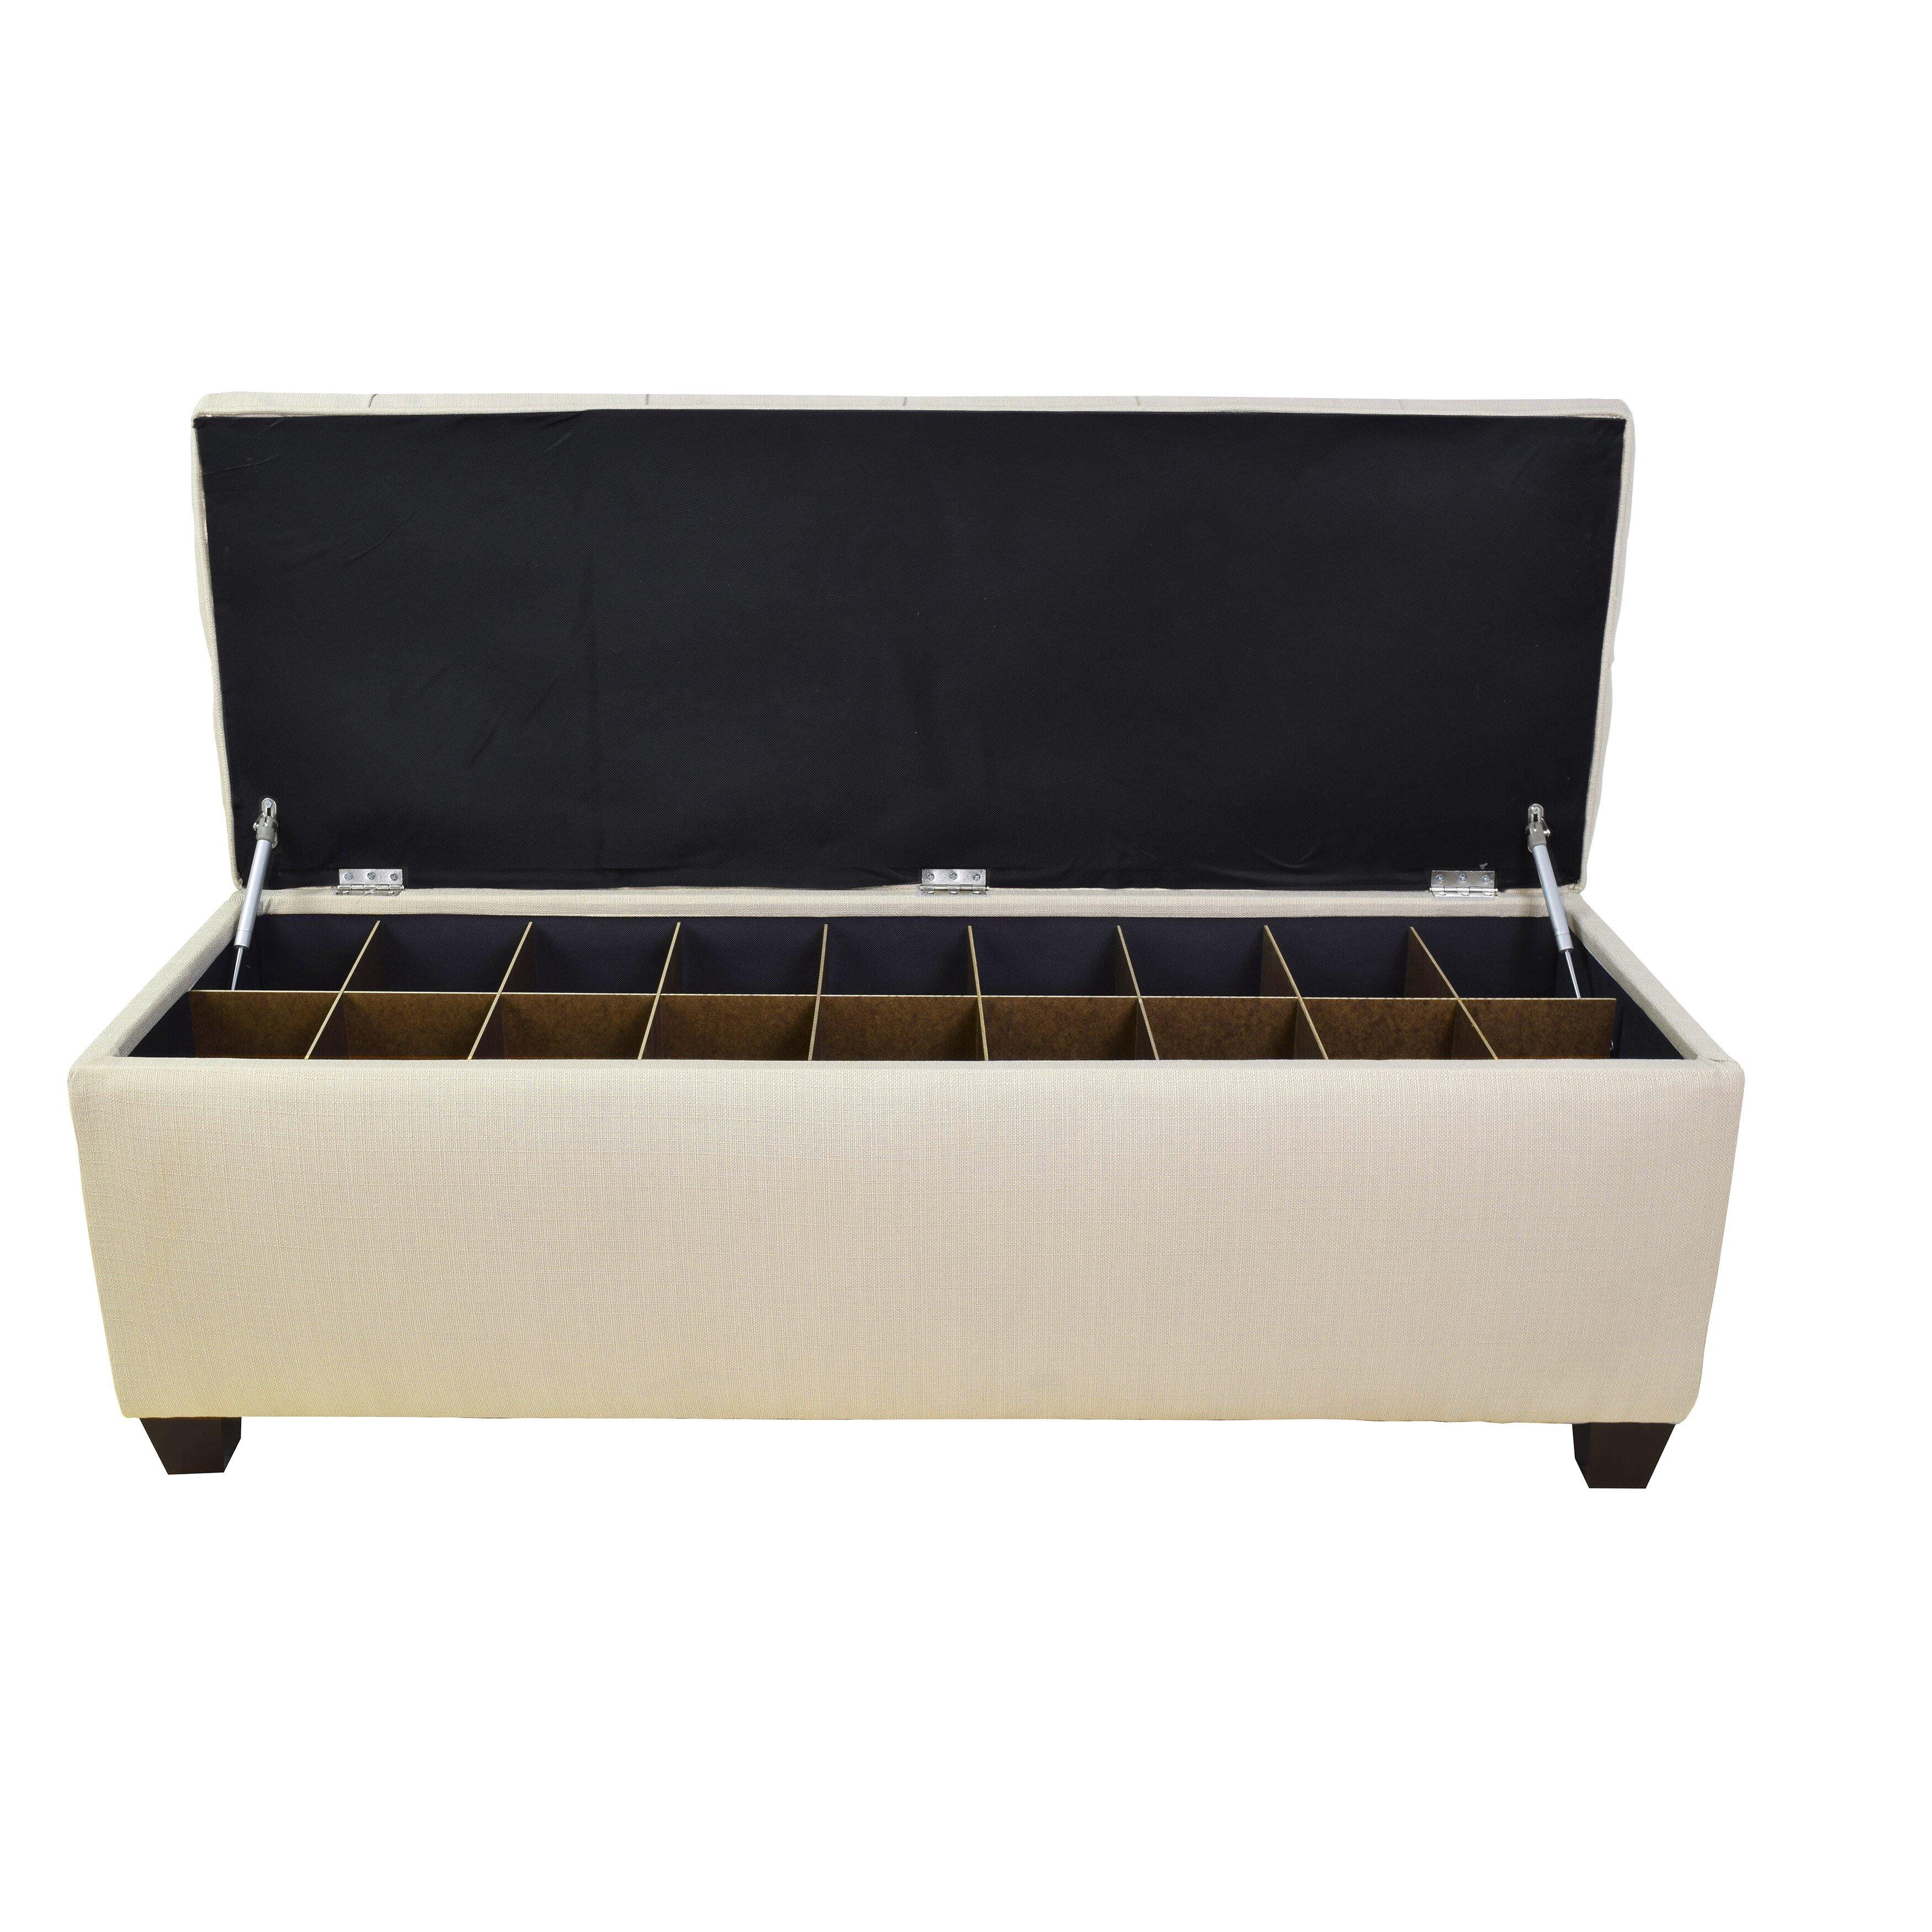 The Sole Secret Sole Secret Upholstered Storage Bench Reviews Wayfair